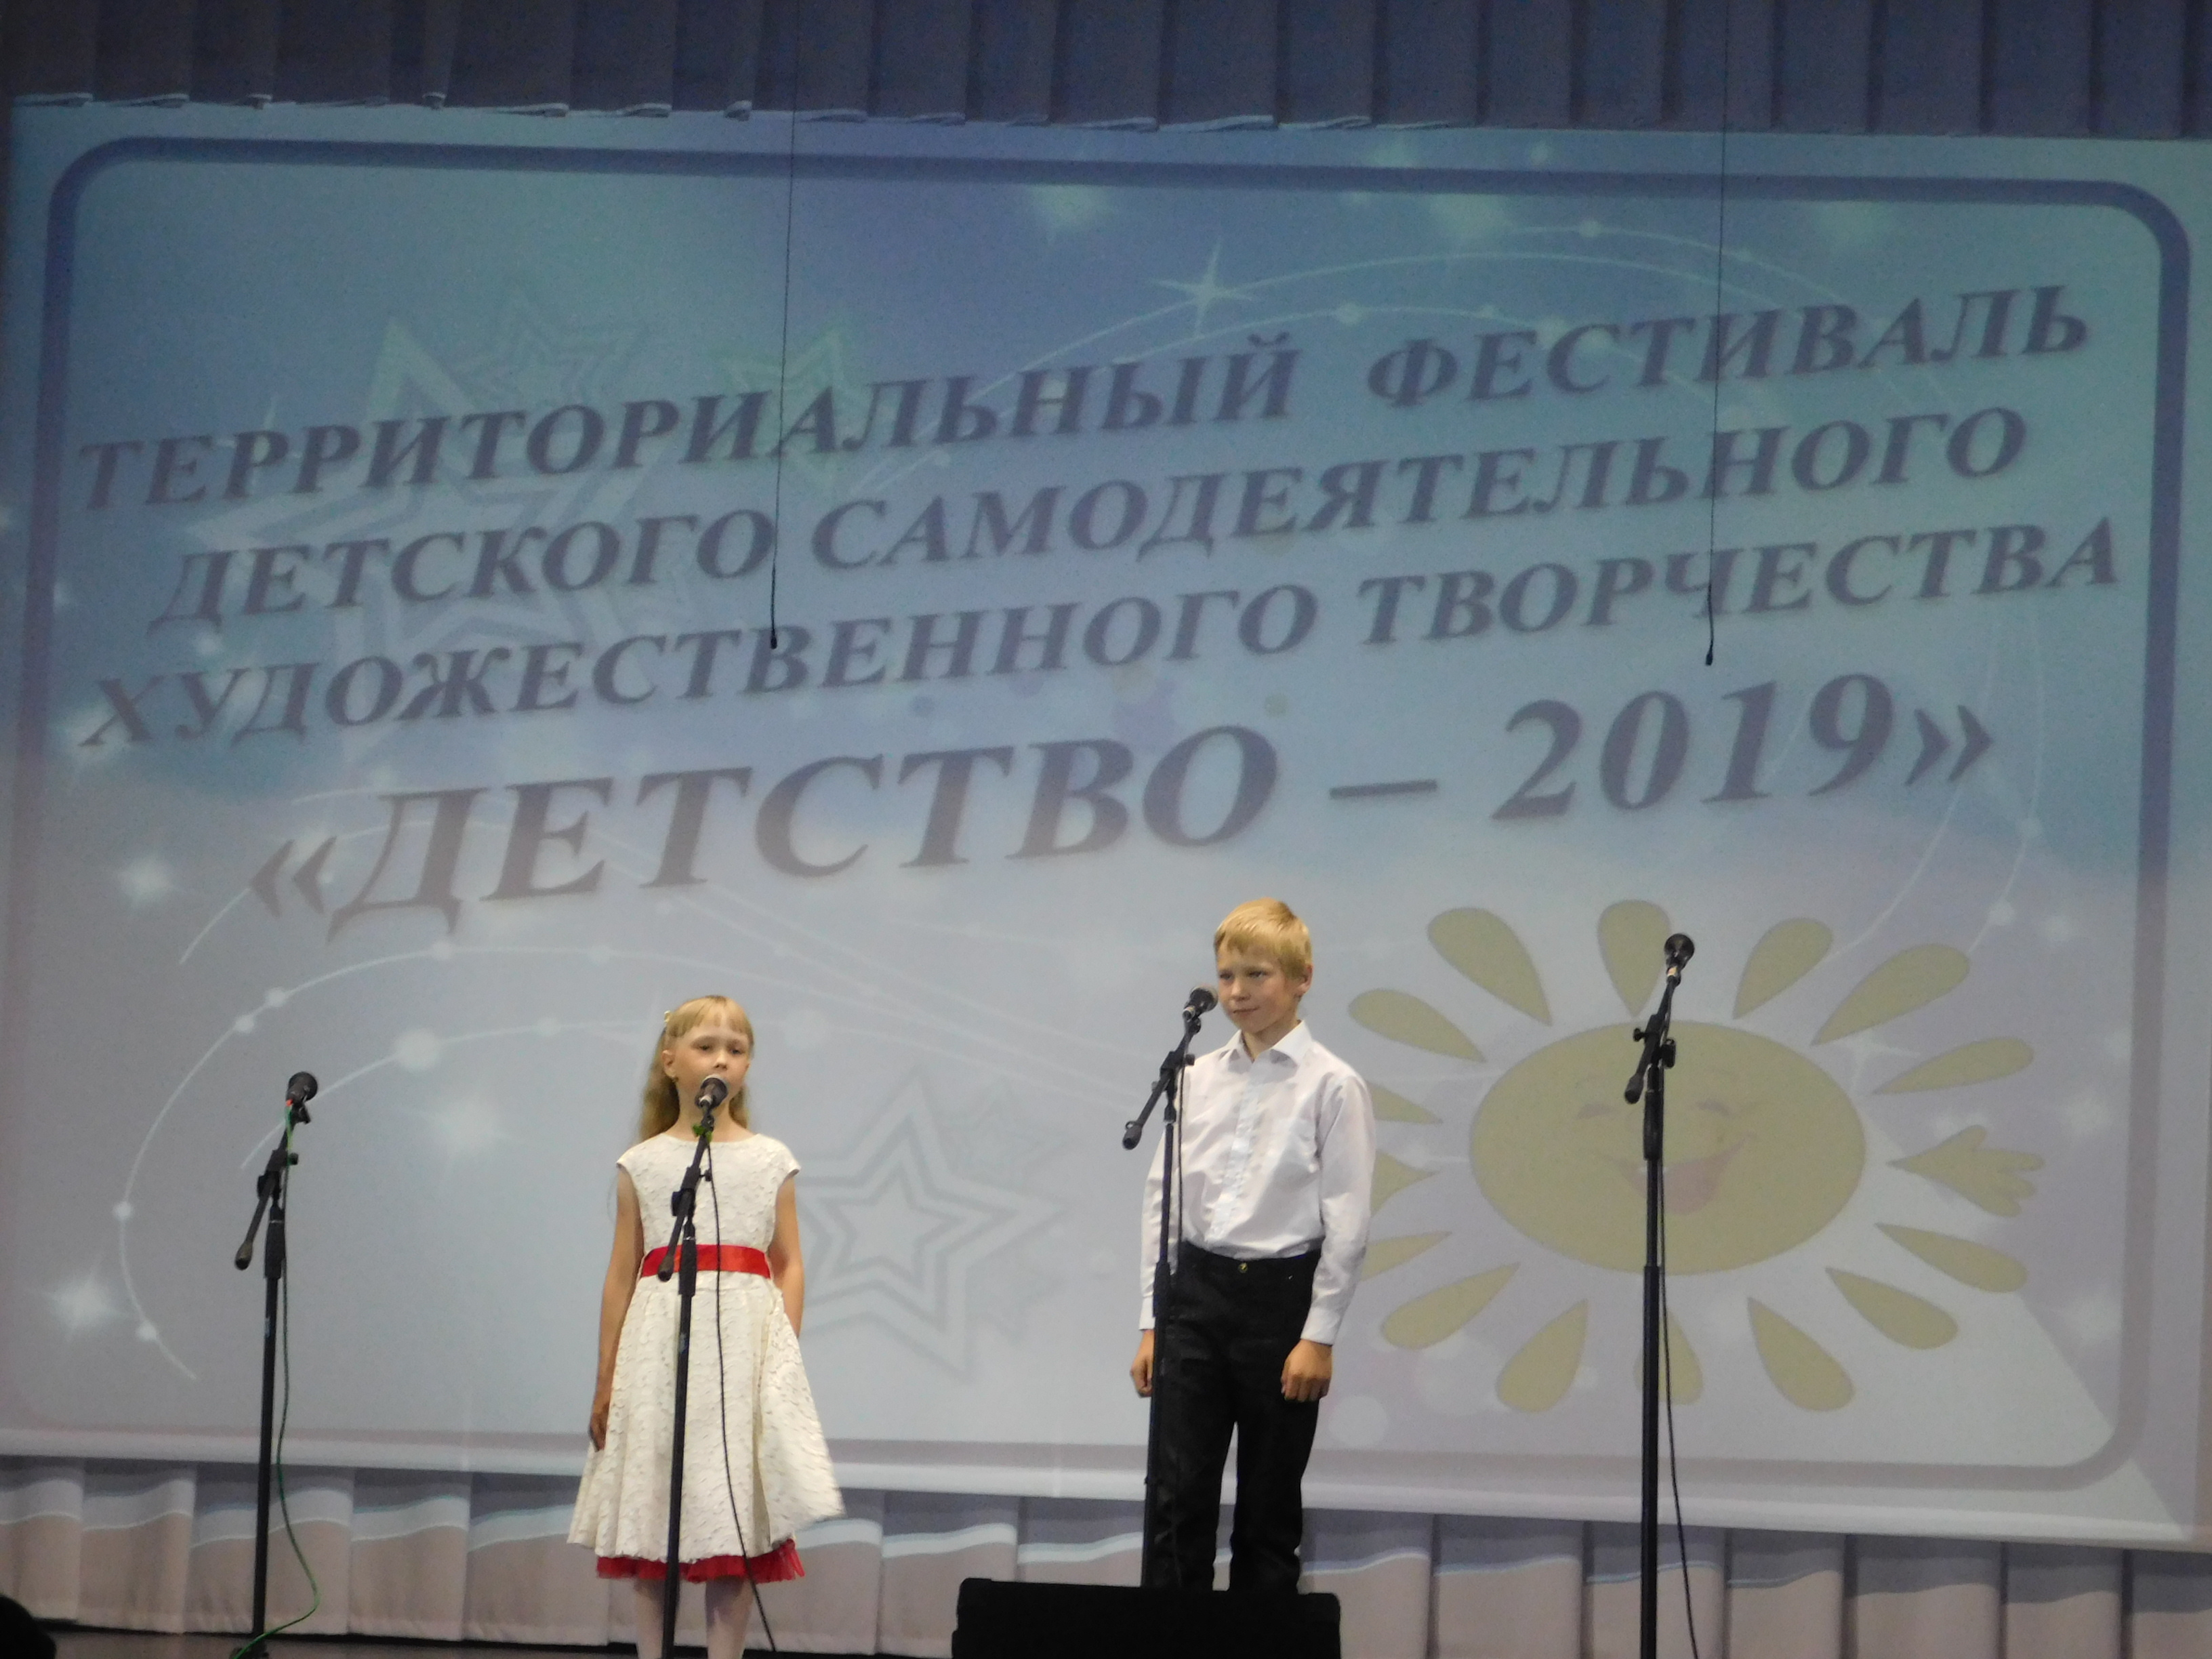 Вика Горбунова и Артем Крутиков Андронов